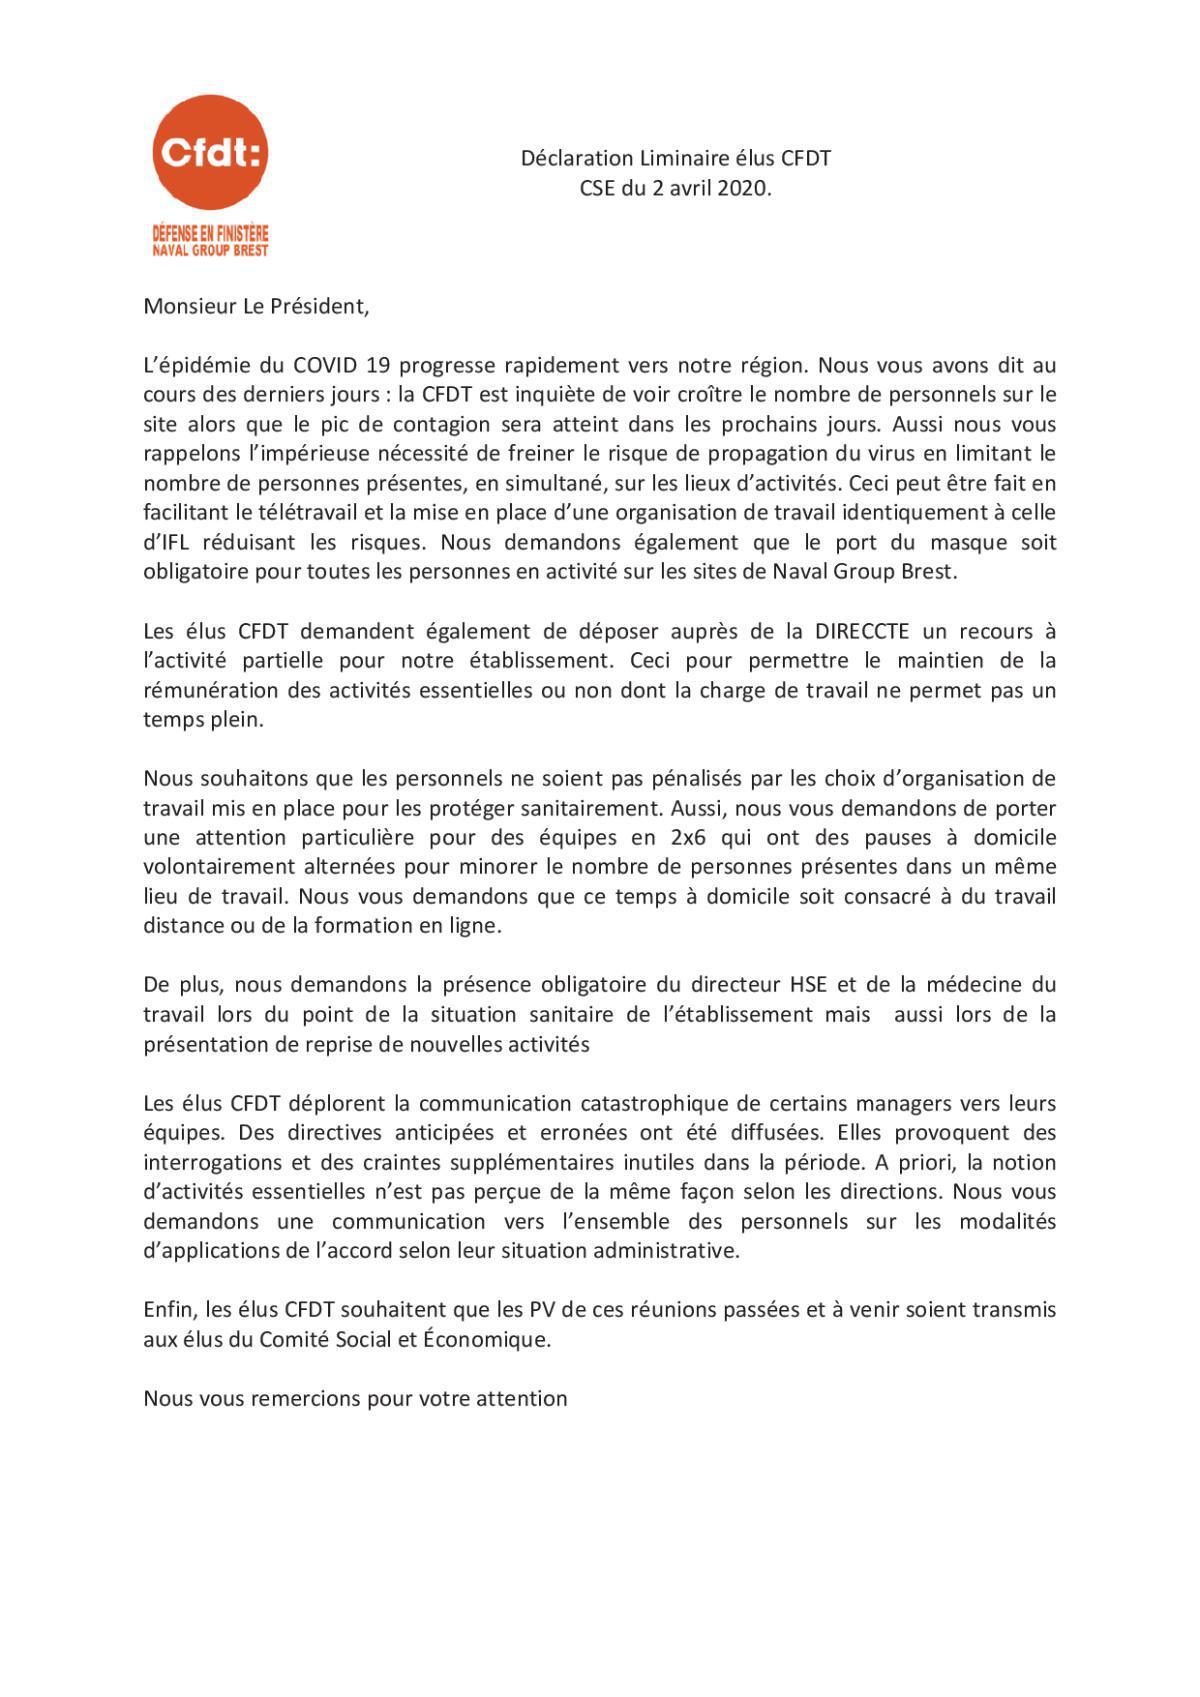 INFOS BREST DU 2 AVRIL 2020 _ DECLARATION LIMINAIRE